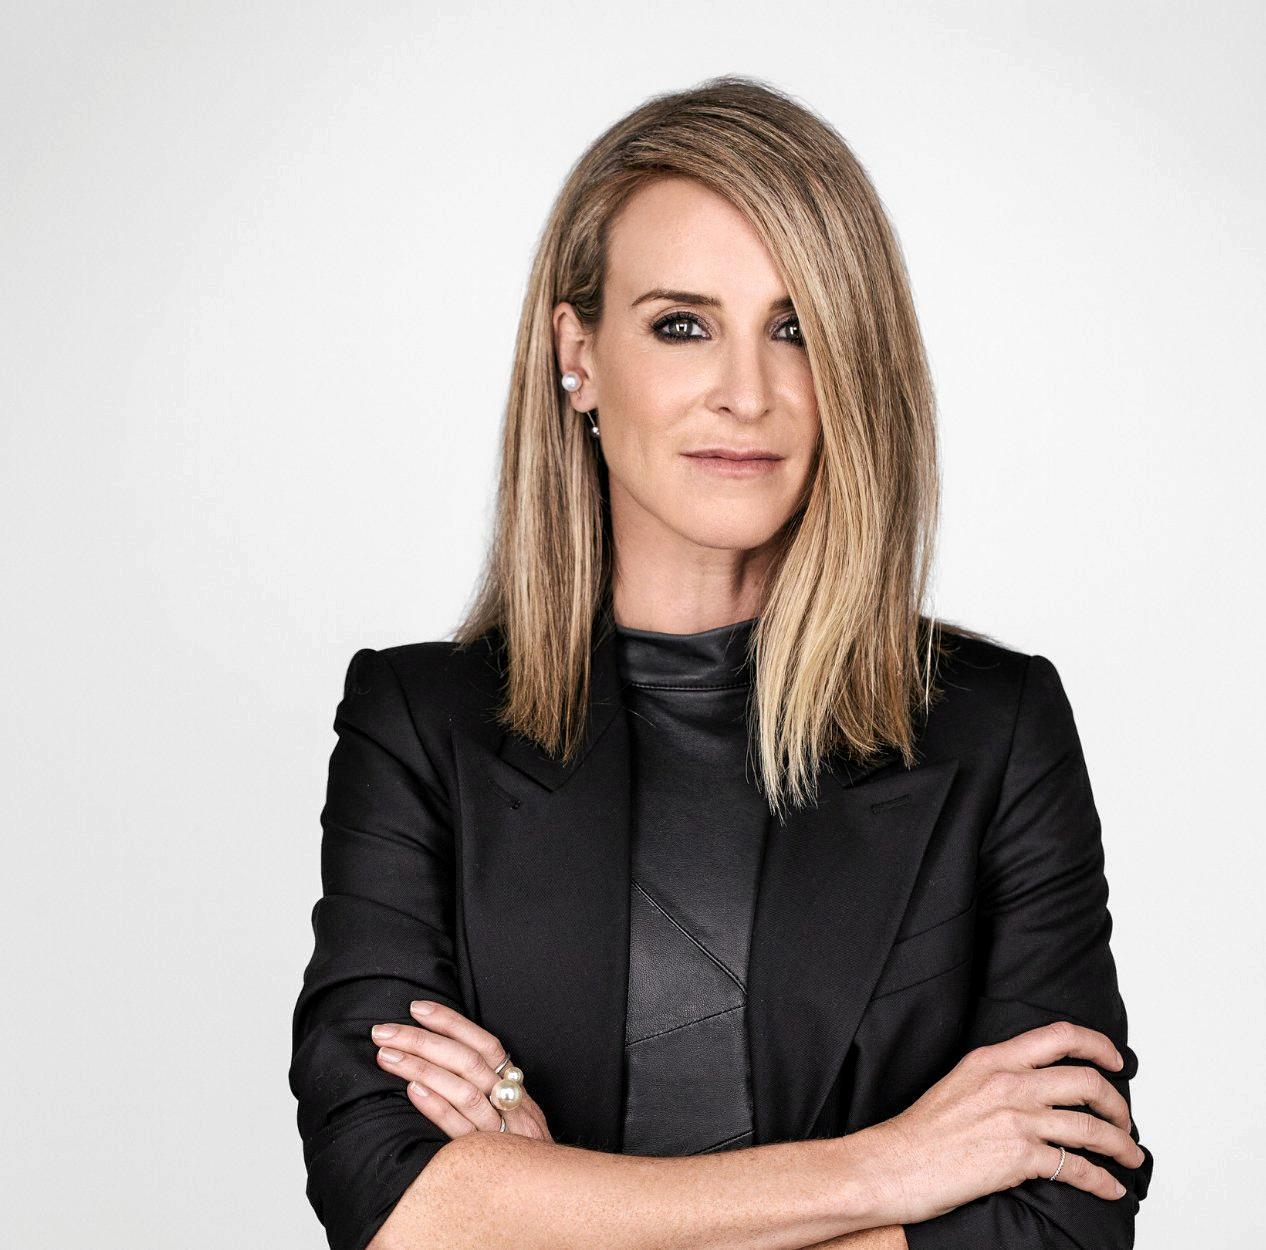 Fashion guru Amanda Shadforth